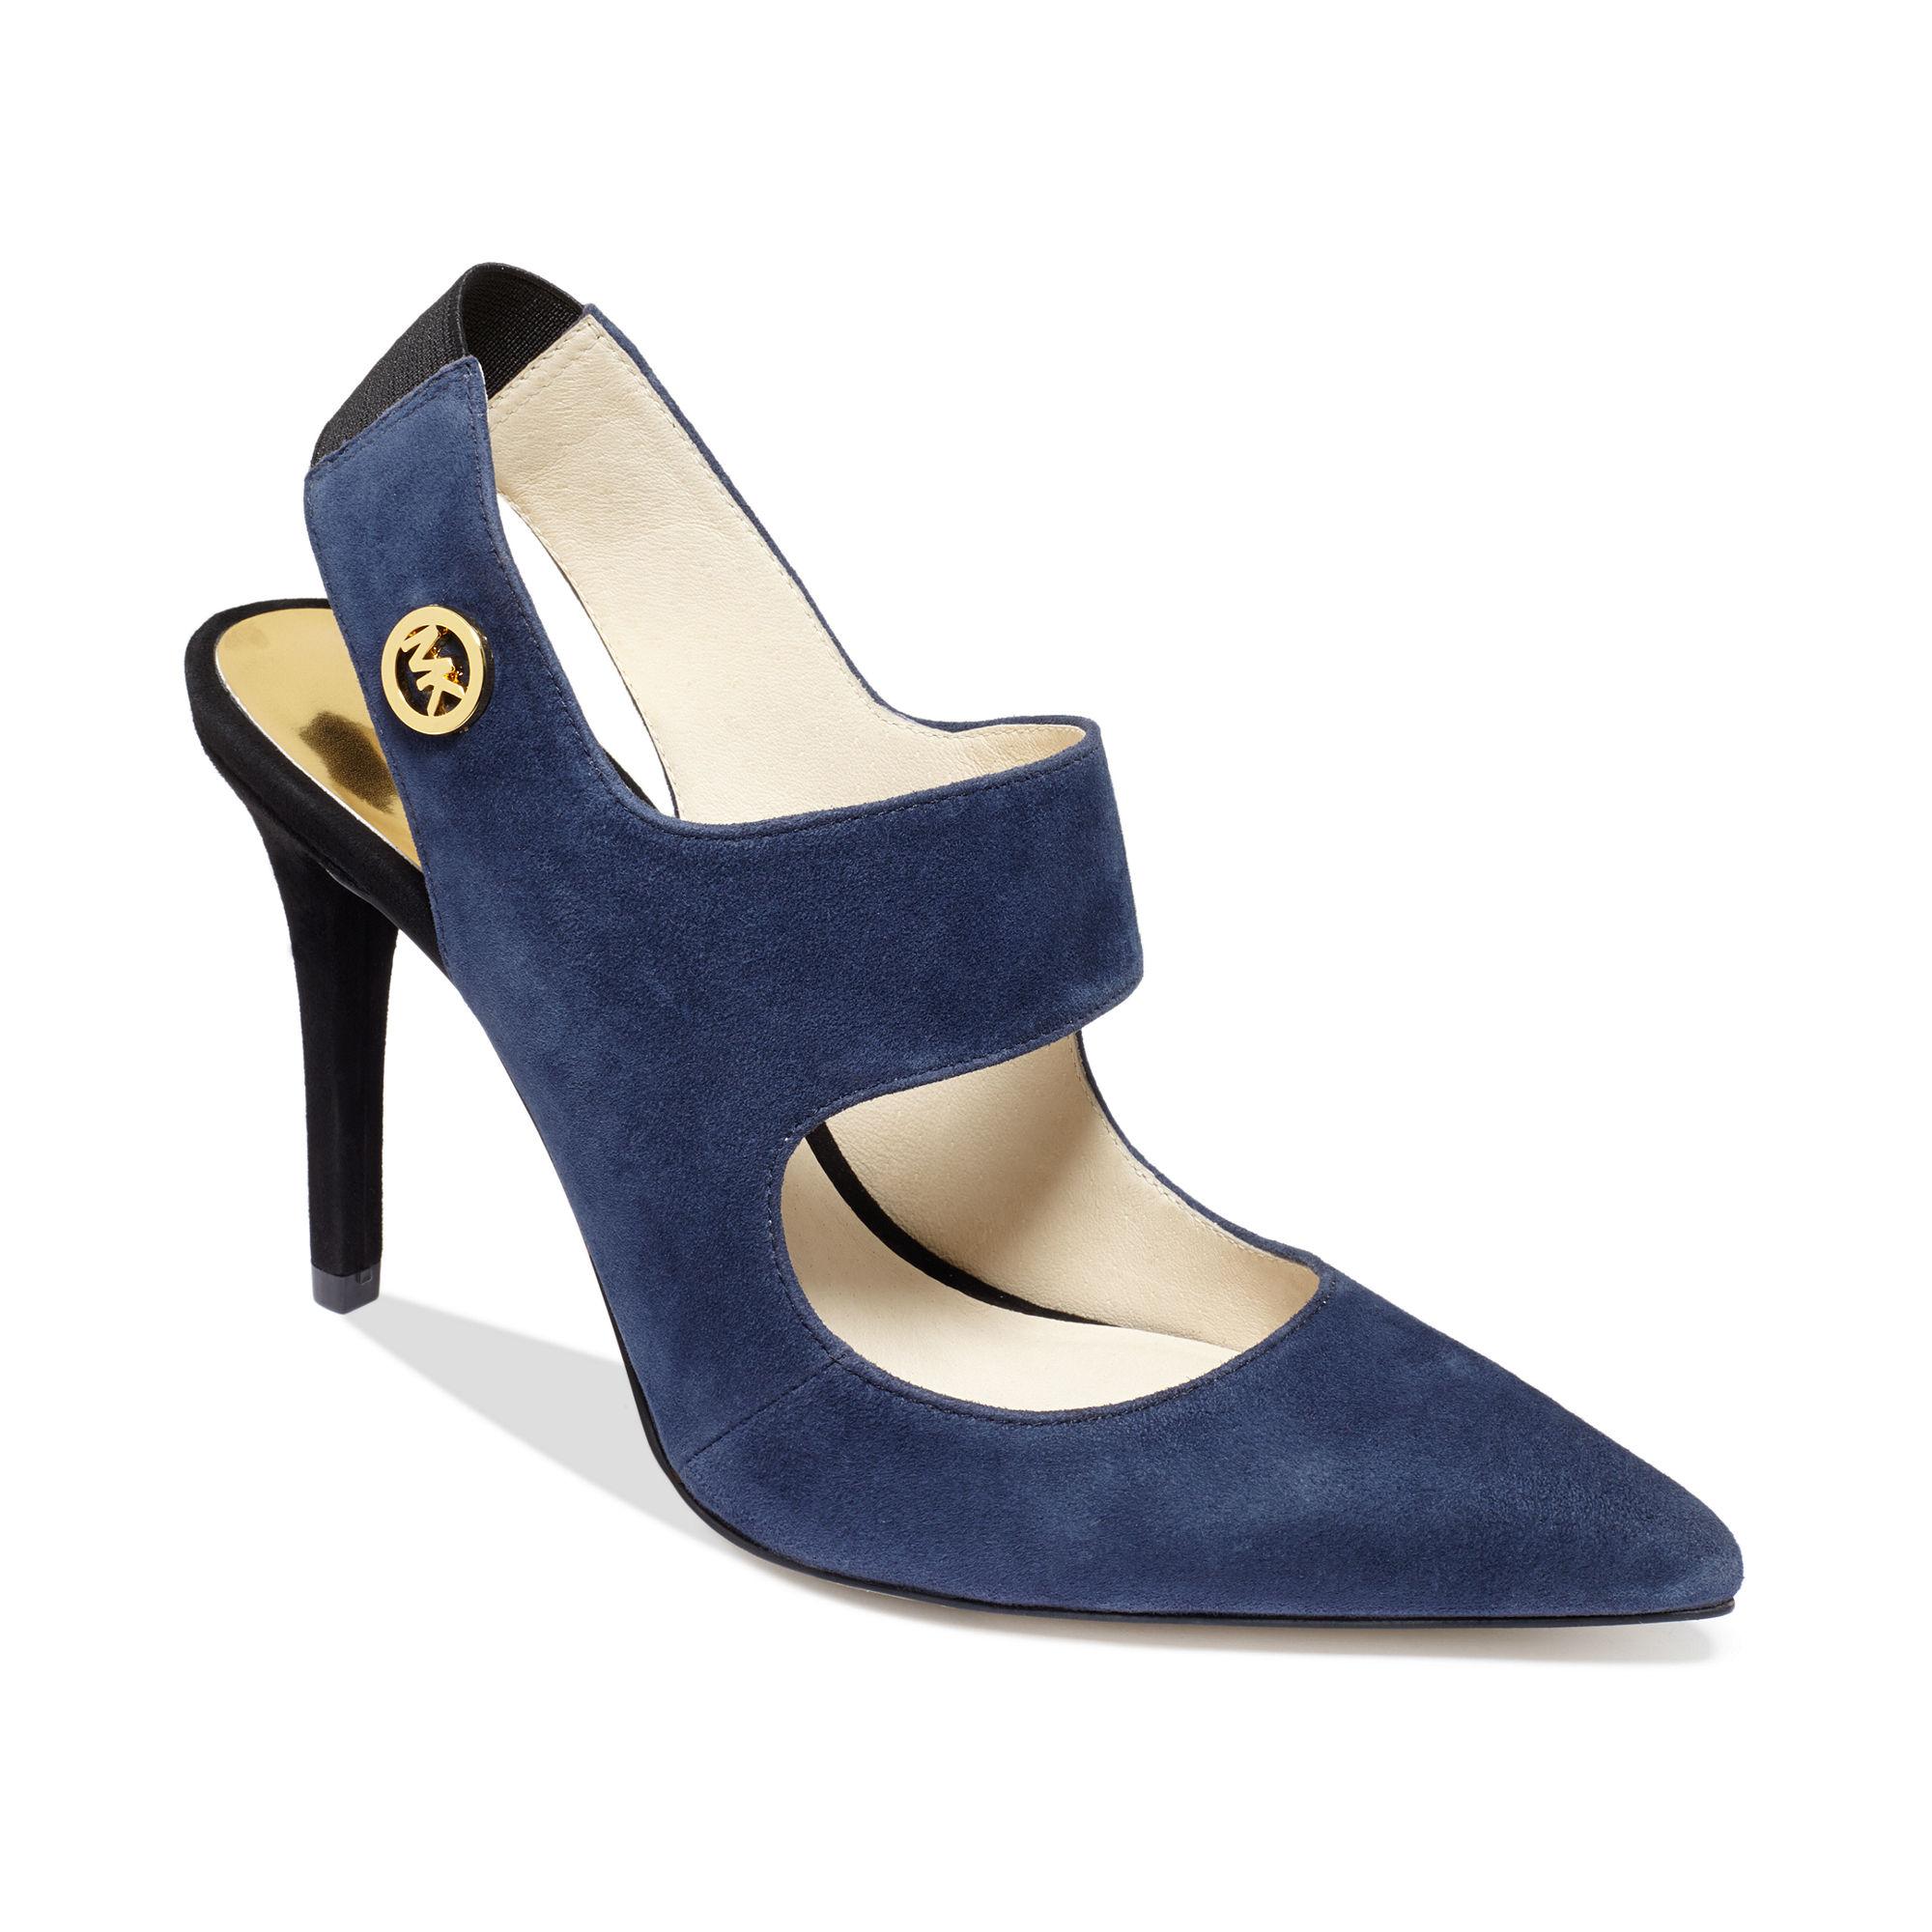 f4a0c9b047e ... Lyst Michael Kors Sivian Sling Mid Heel Pumps in Blue